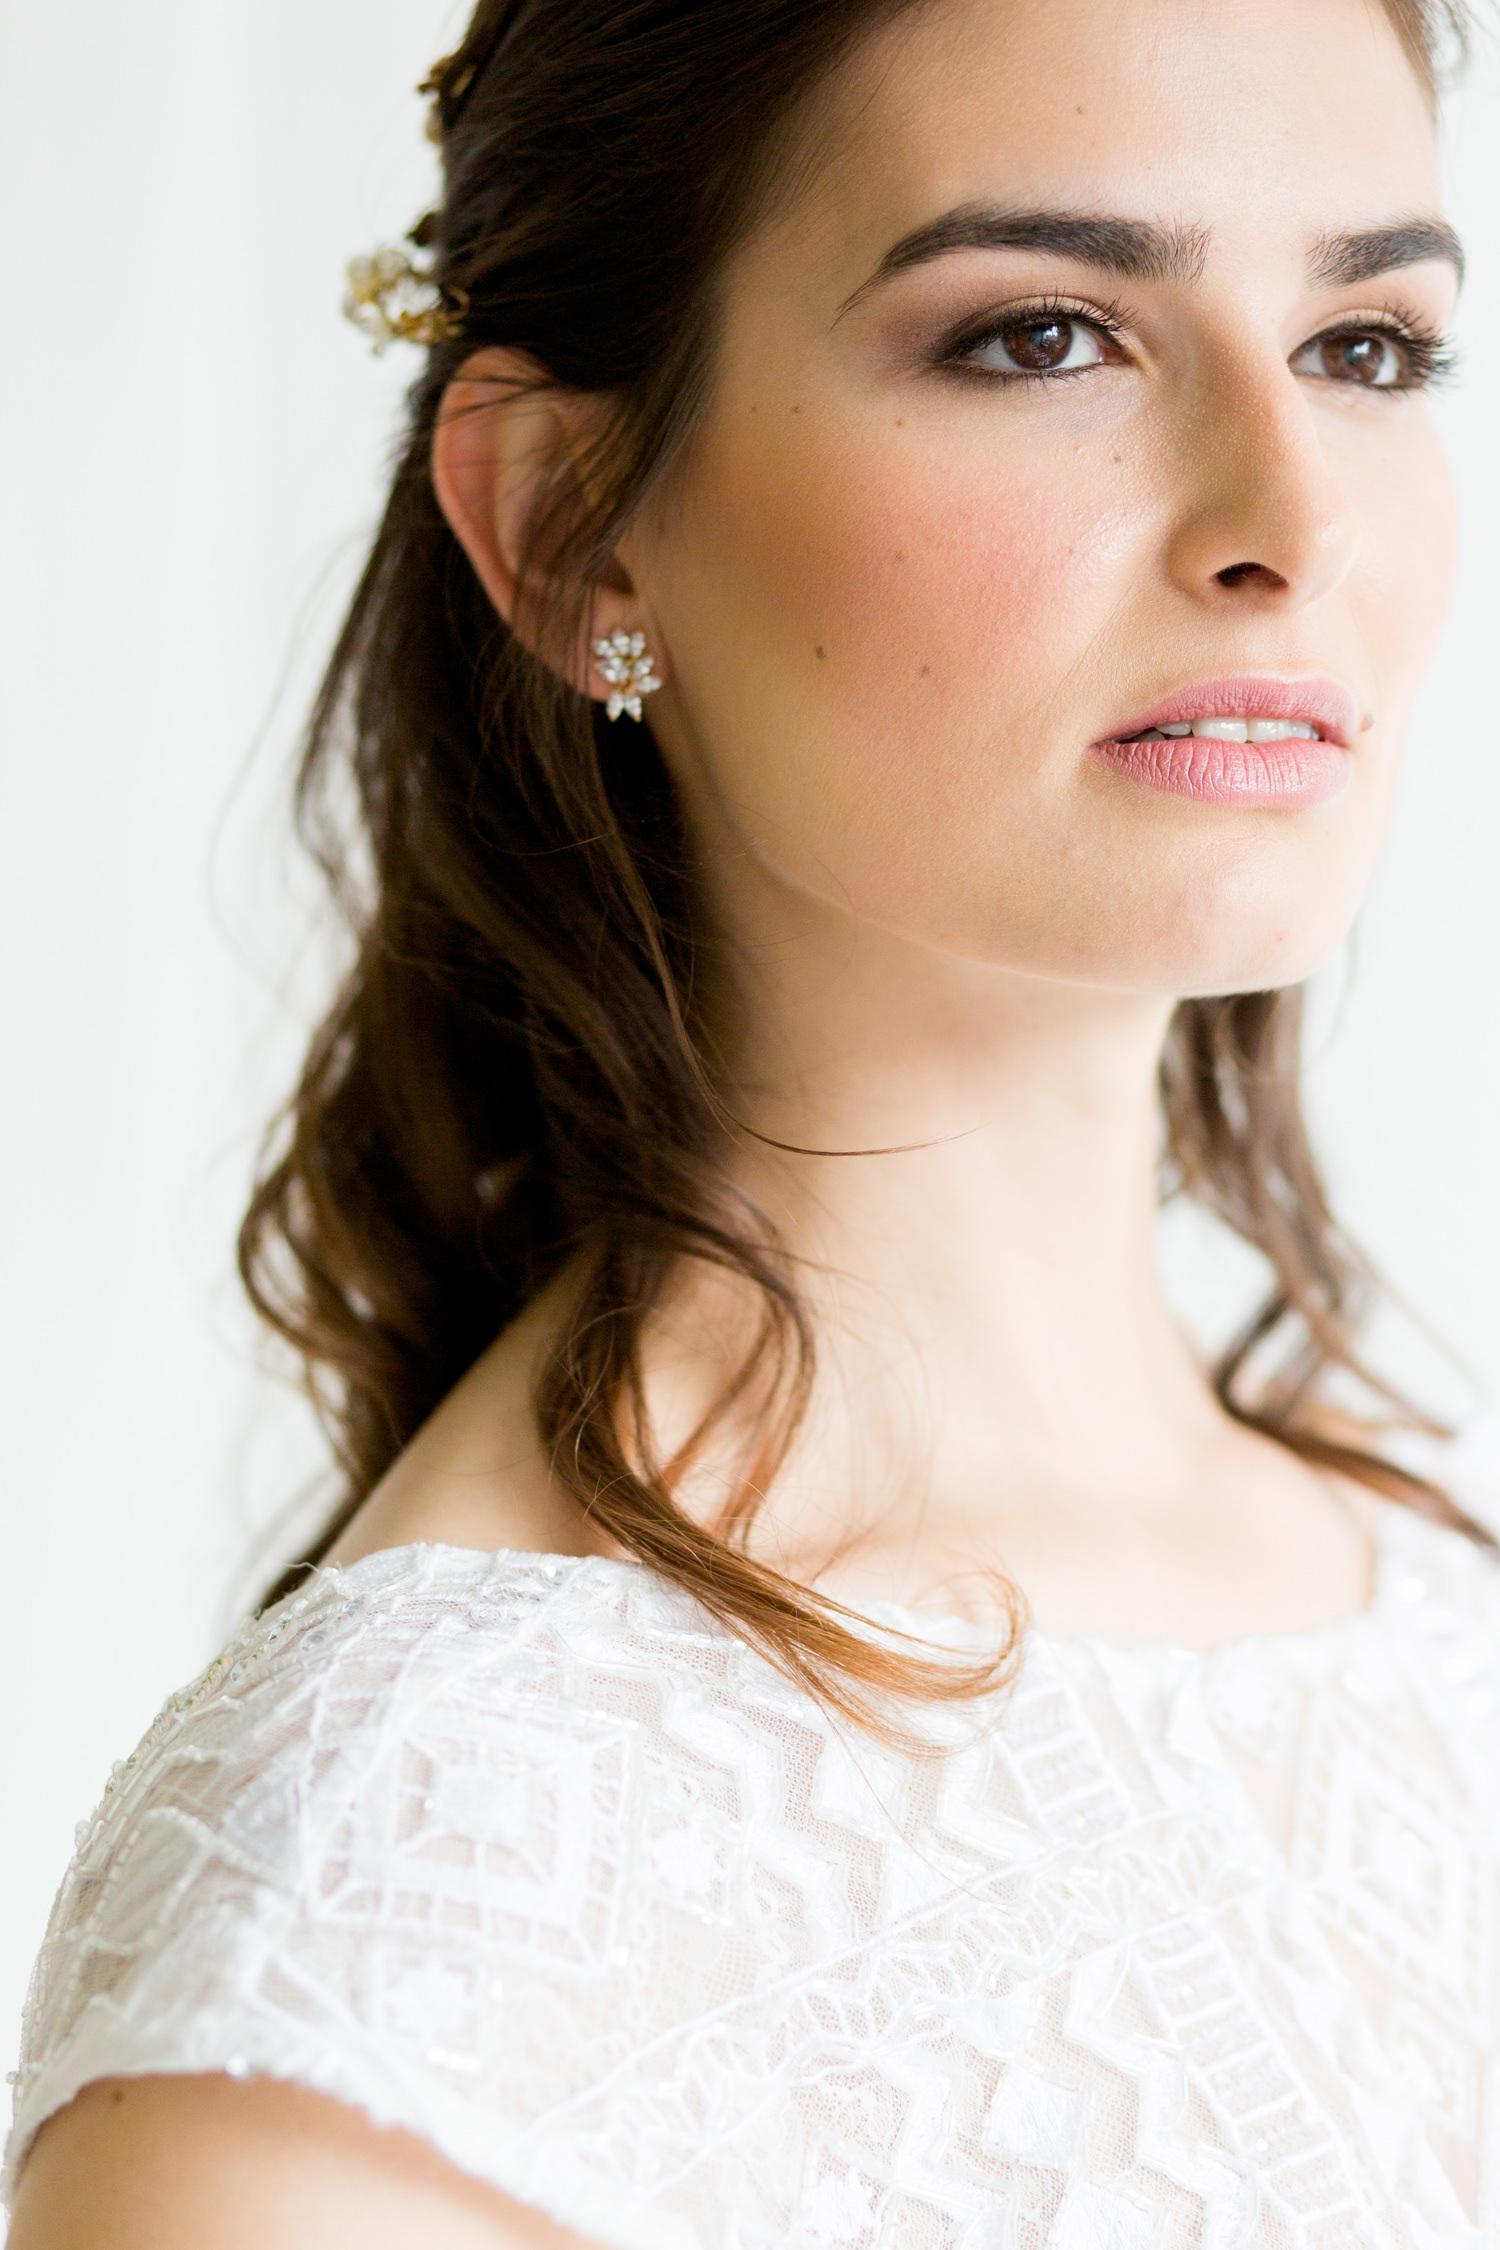 Industrial Chic Botanical Wedding 9 - flawless natural make-up on a brunette bride